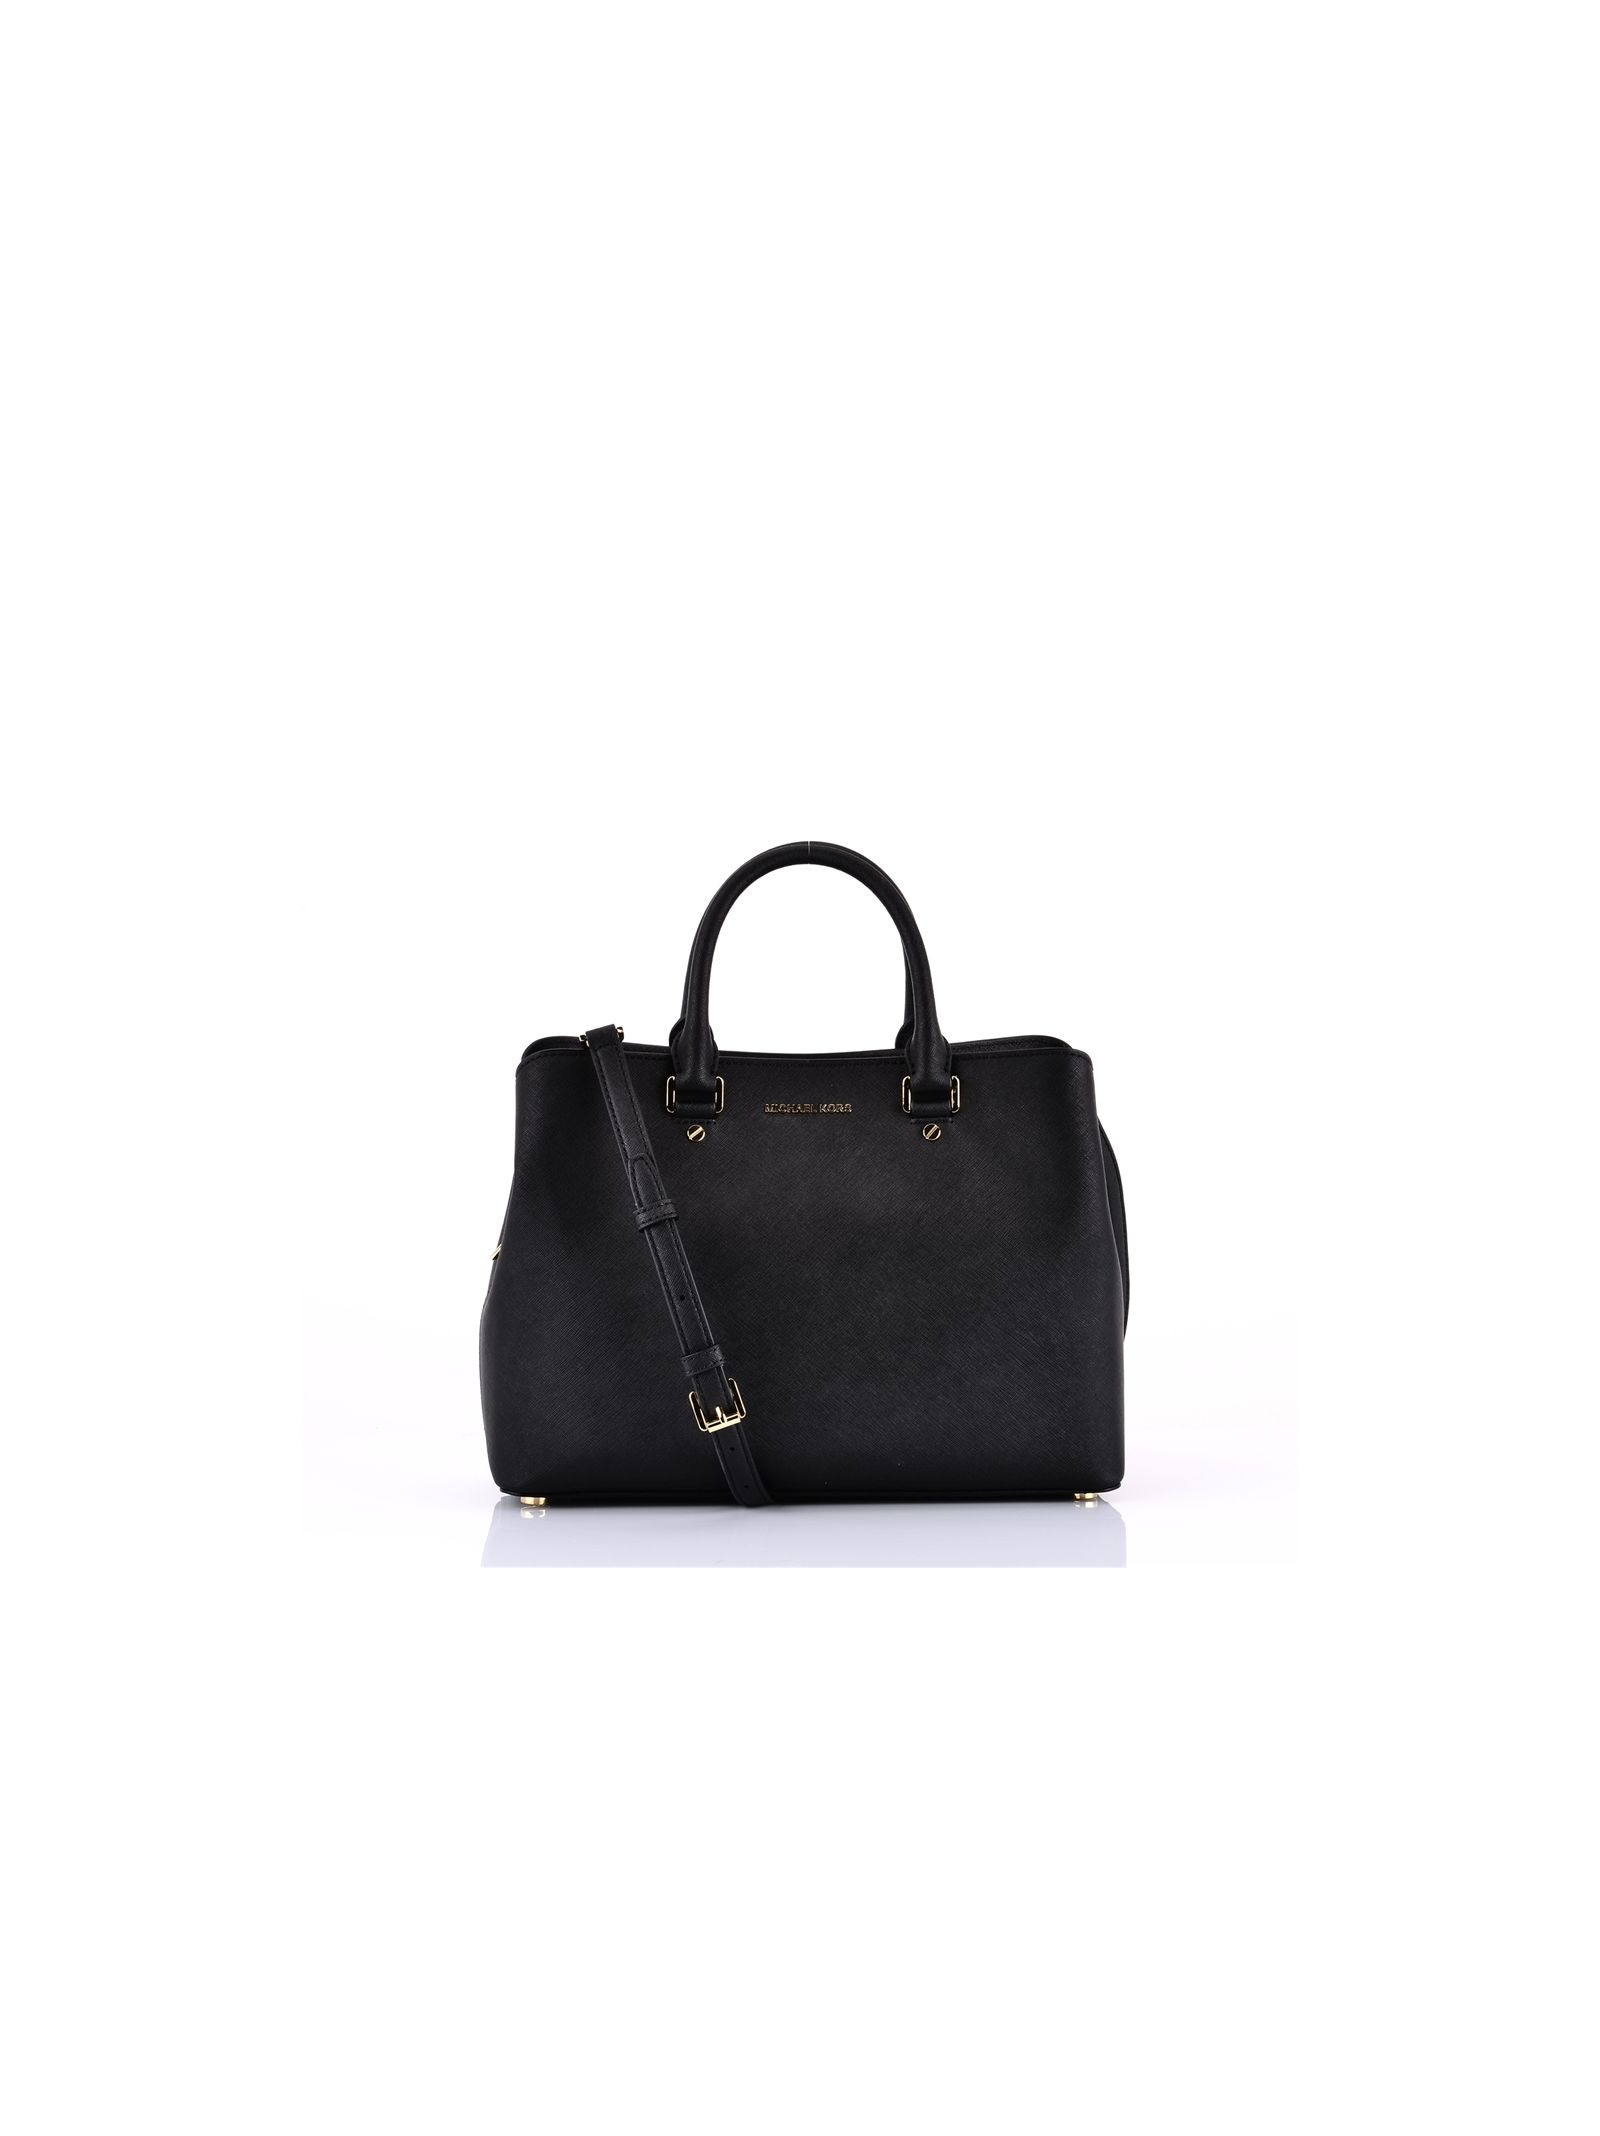 michael kors female black gold savannah large satchel